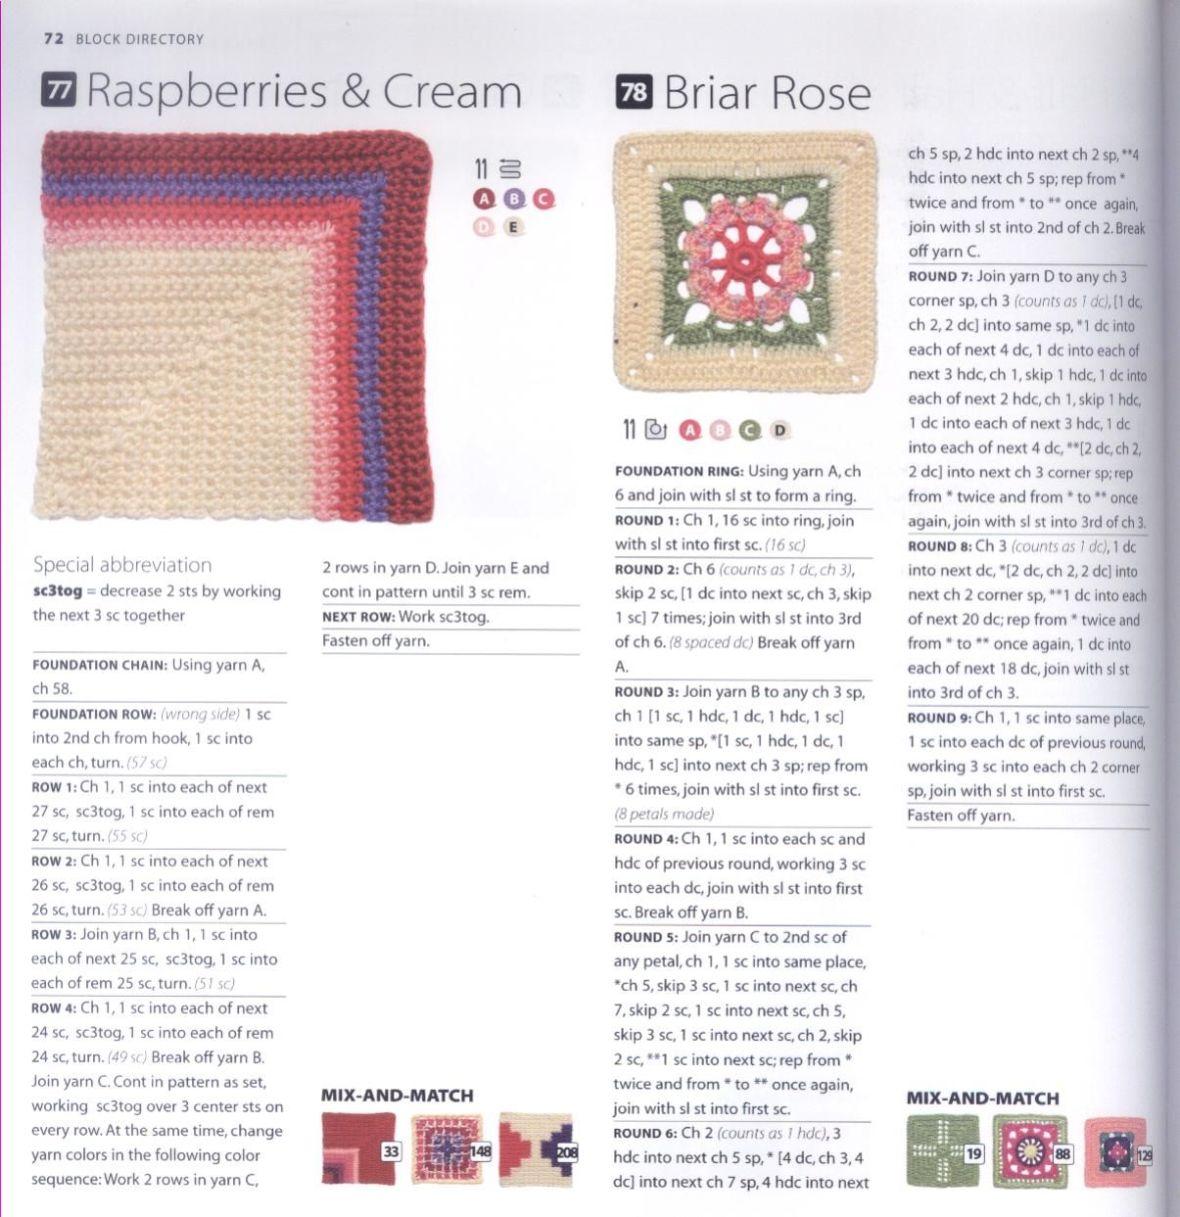 200 Crocheted Blocks for blankets, throws & Afghans 072